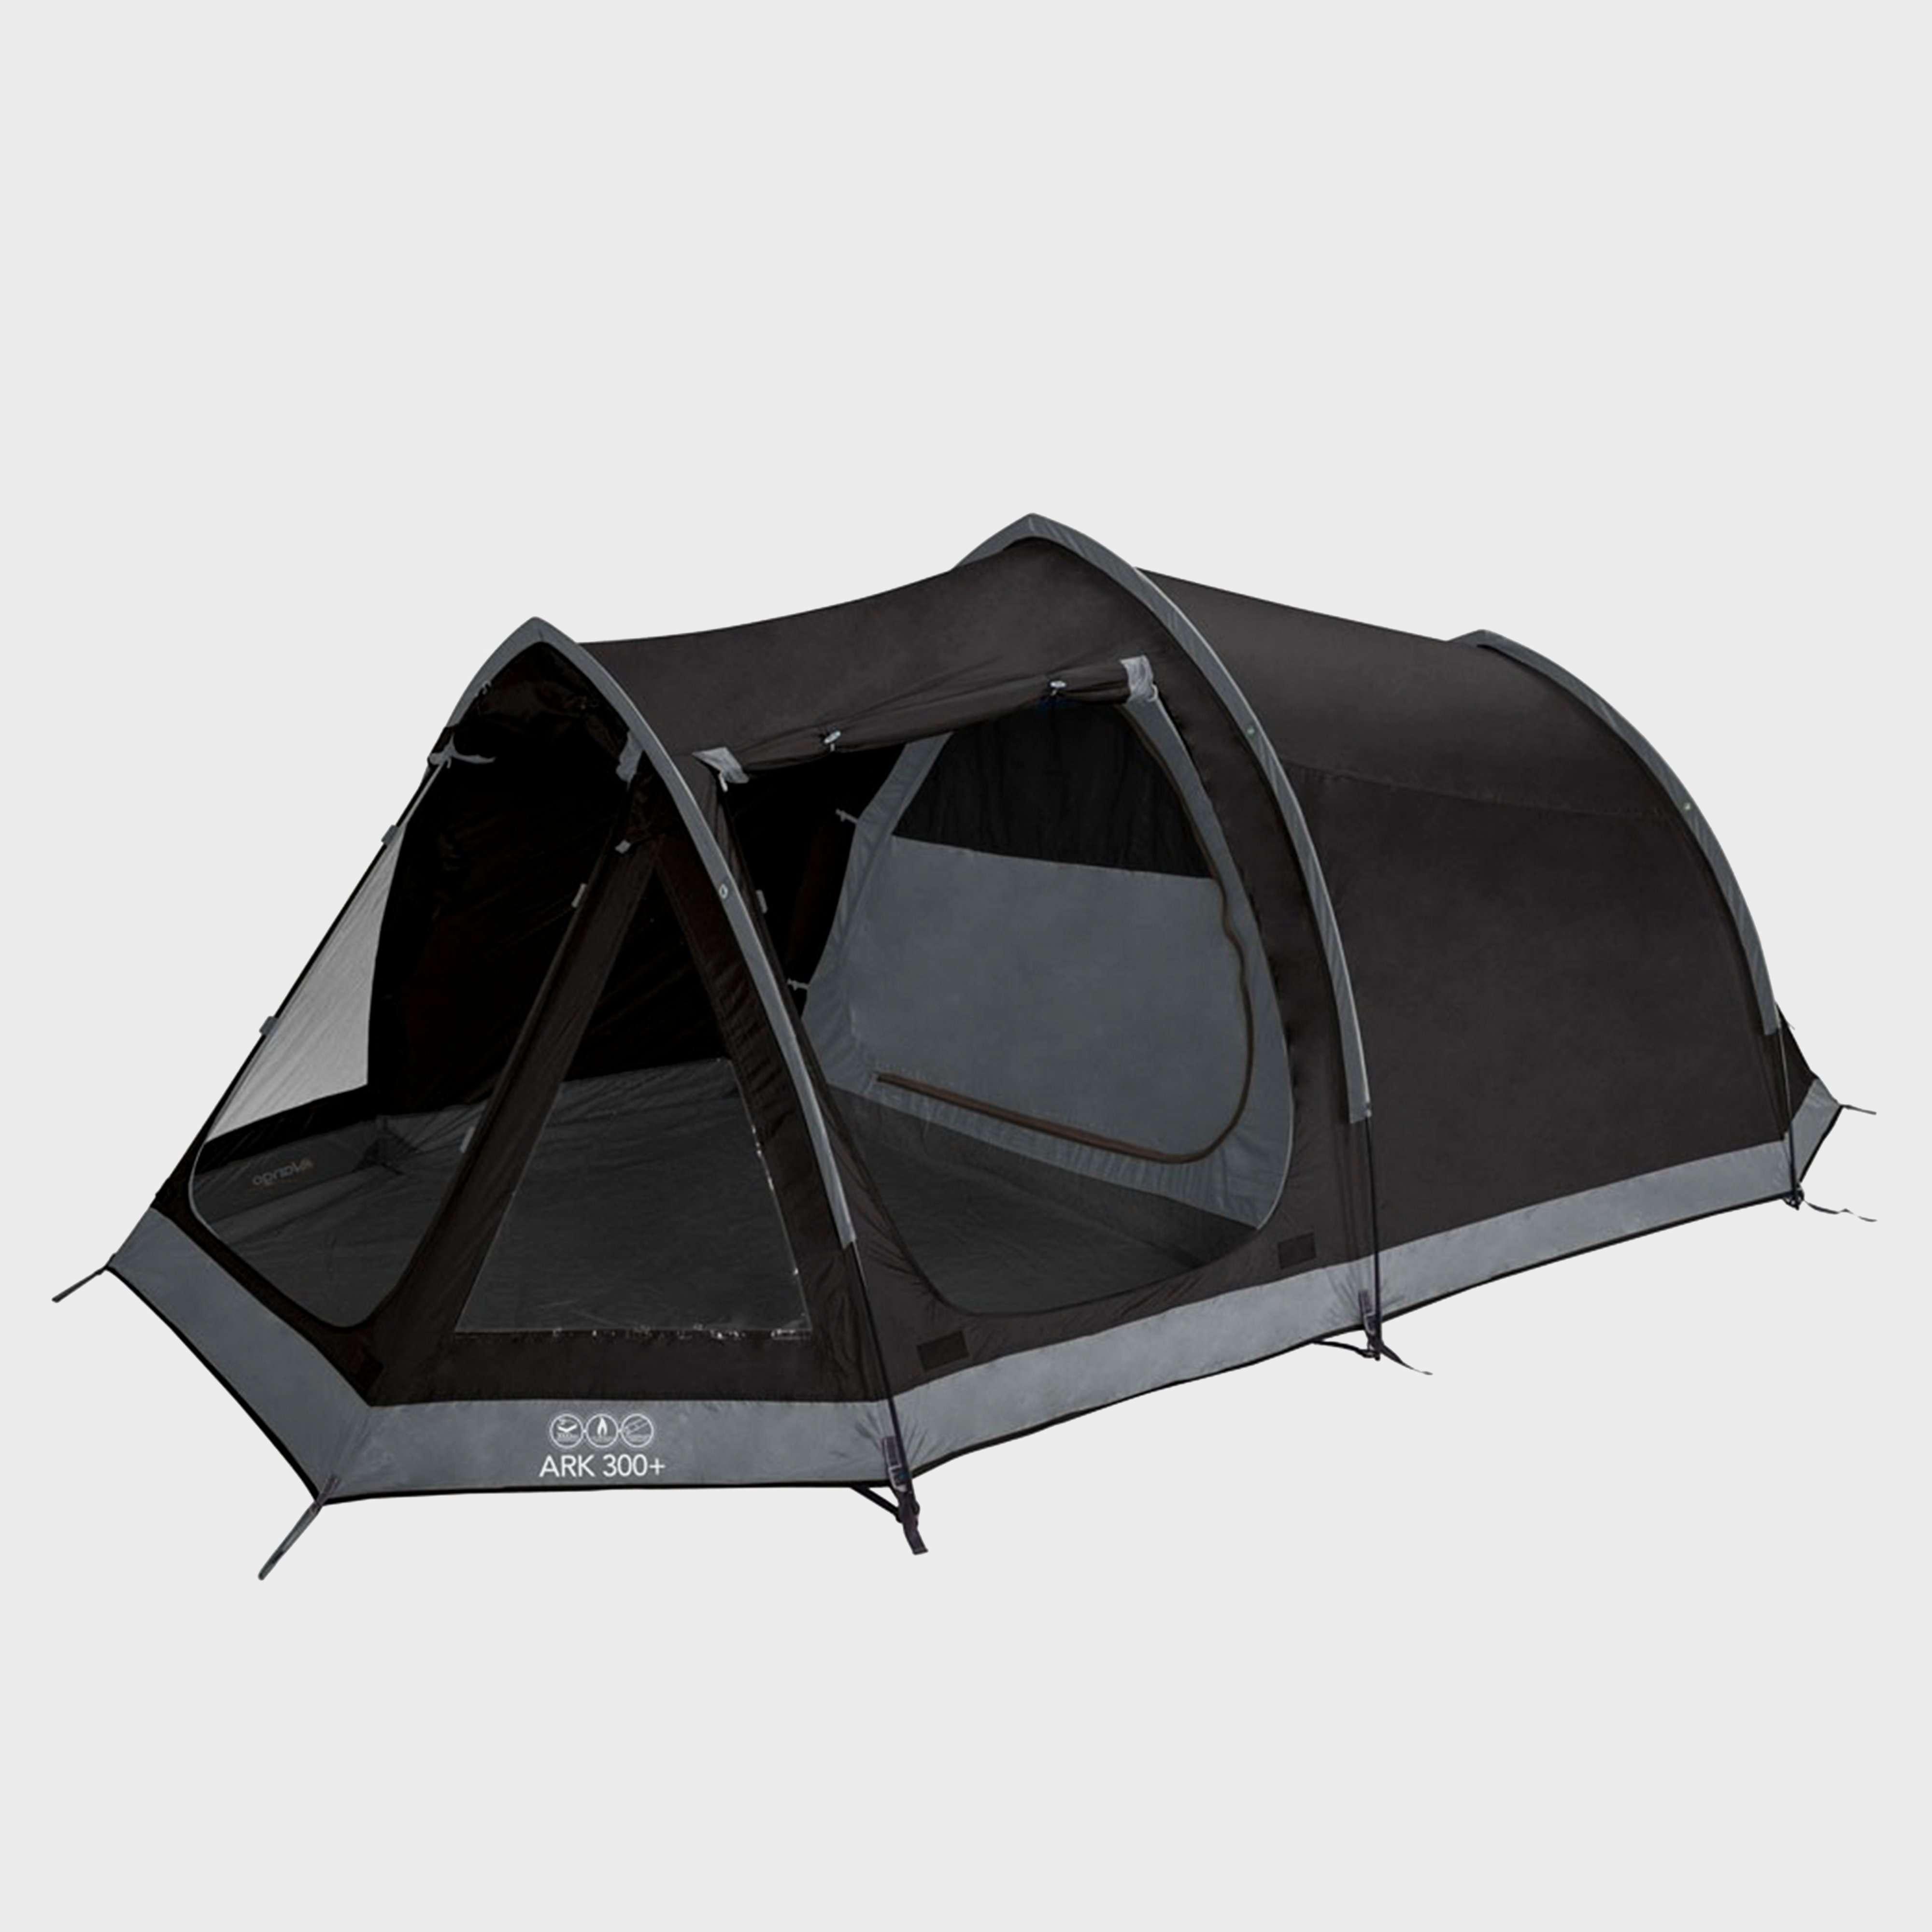 VANGO Ark 300 Plus 3 Person Tunnel Tent